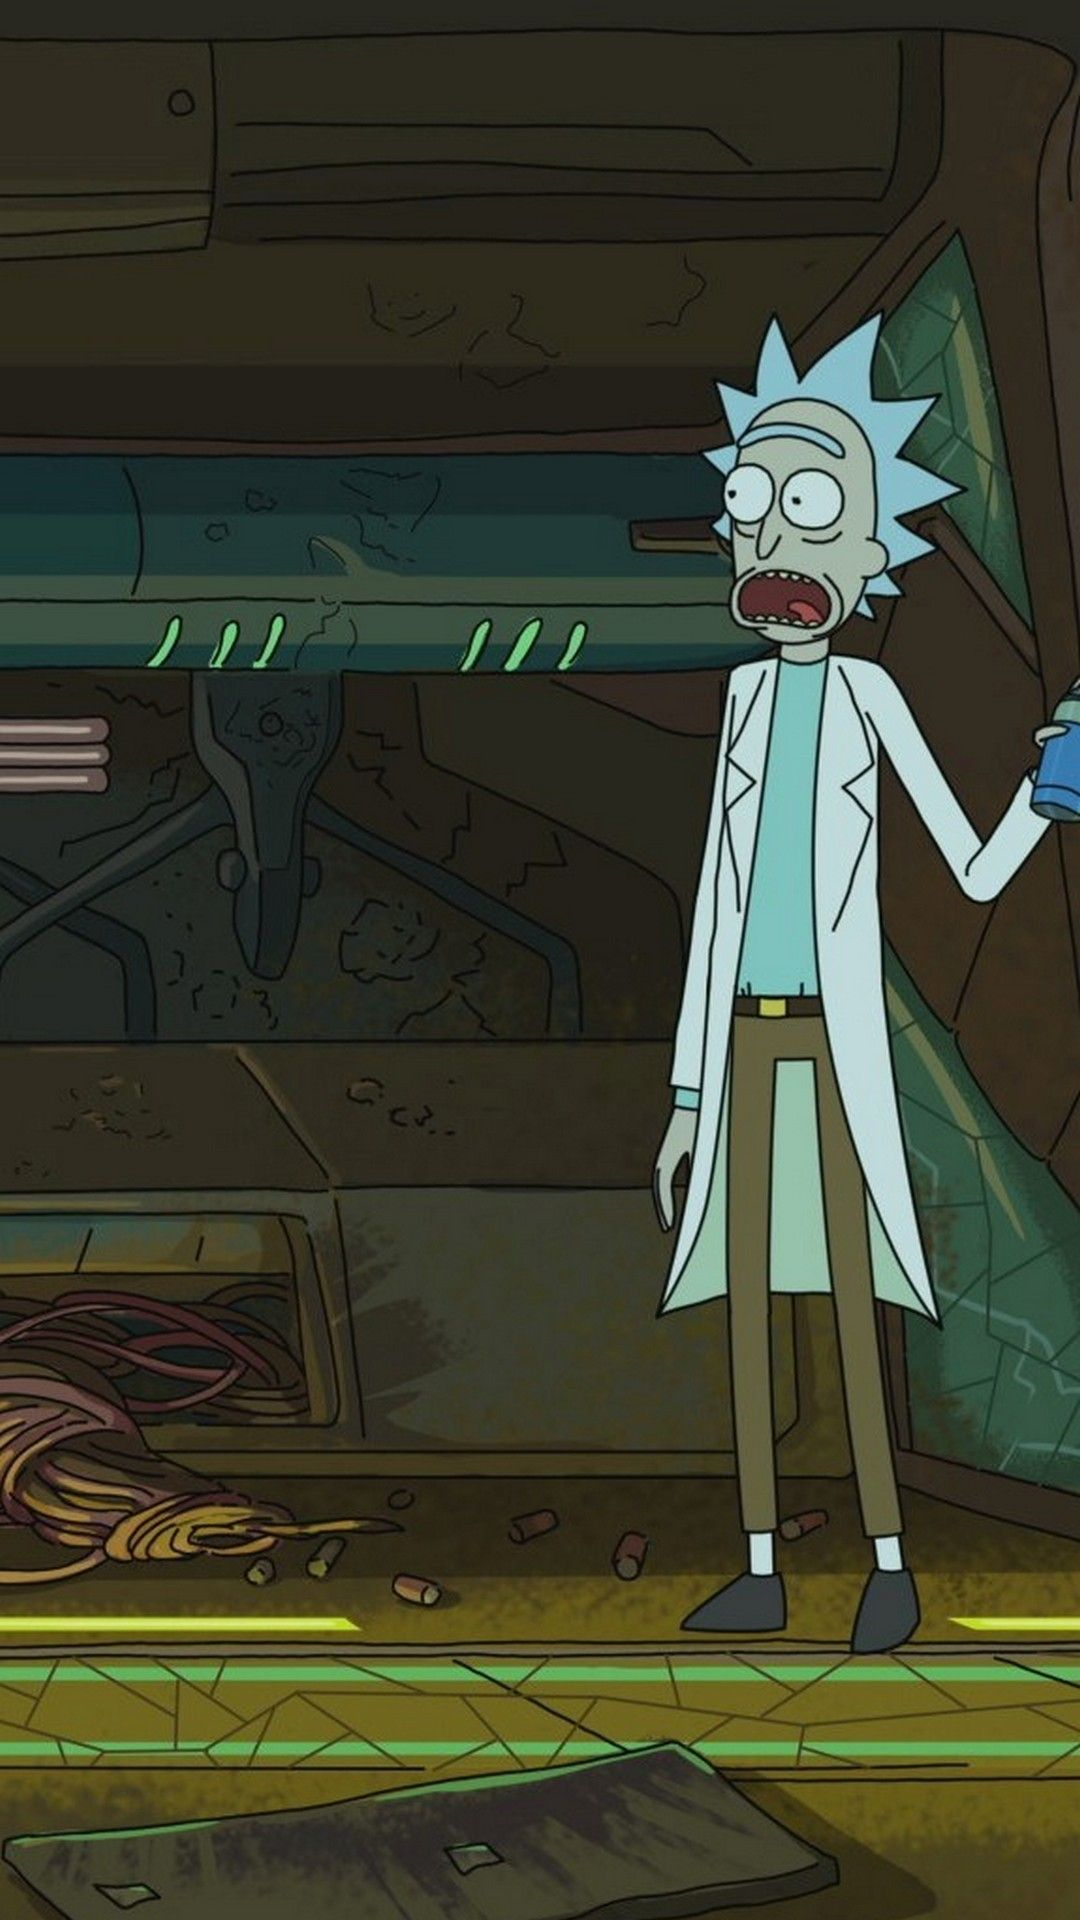 Rick And Morty Iphone 6 Wallpaper Hd Desenhos Aleatorios Papel De Parede Wallpaper Personagens Rick E Morty